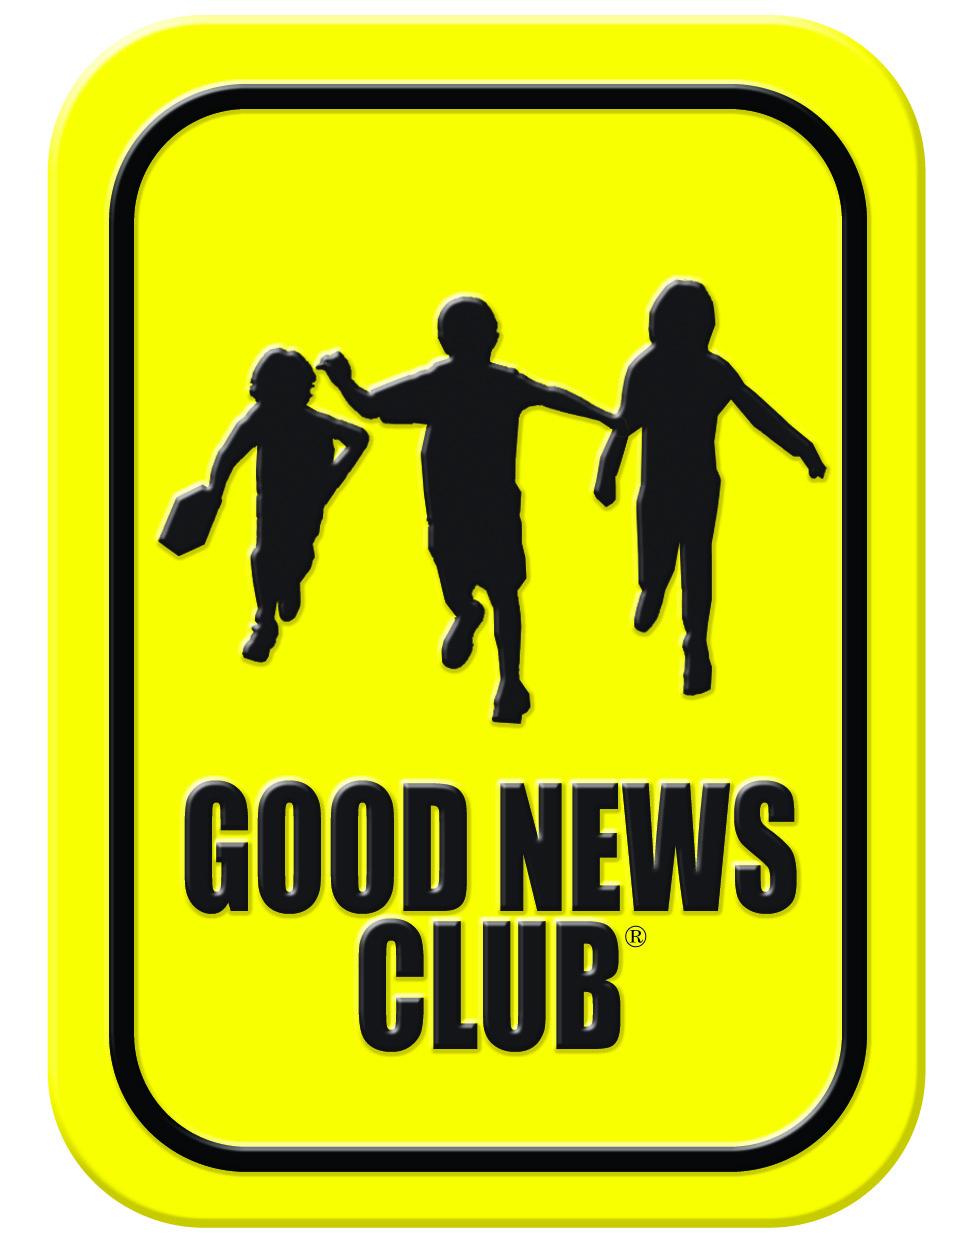 Northeast Church the Good News Club